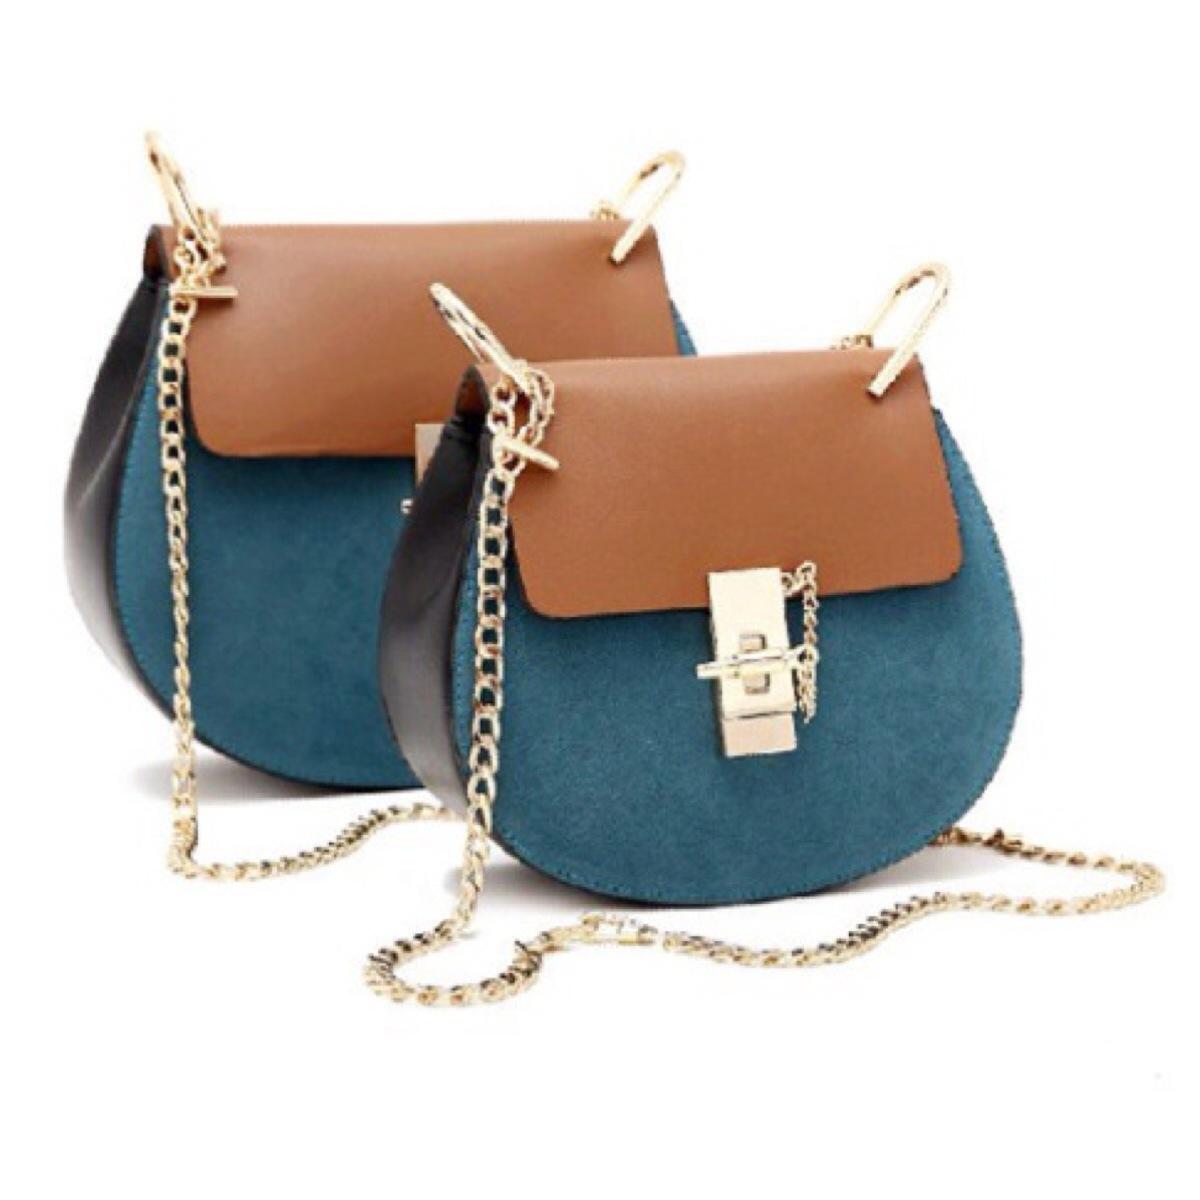 fake chloe purse - The Bag Issue: Drew by Chlo�� | Nanni